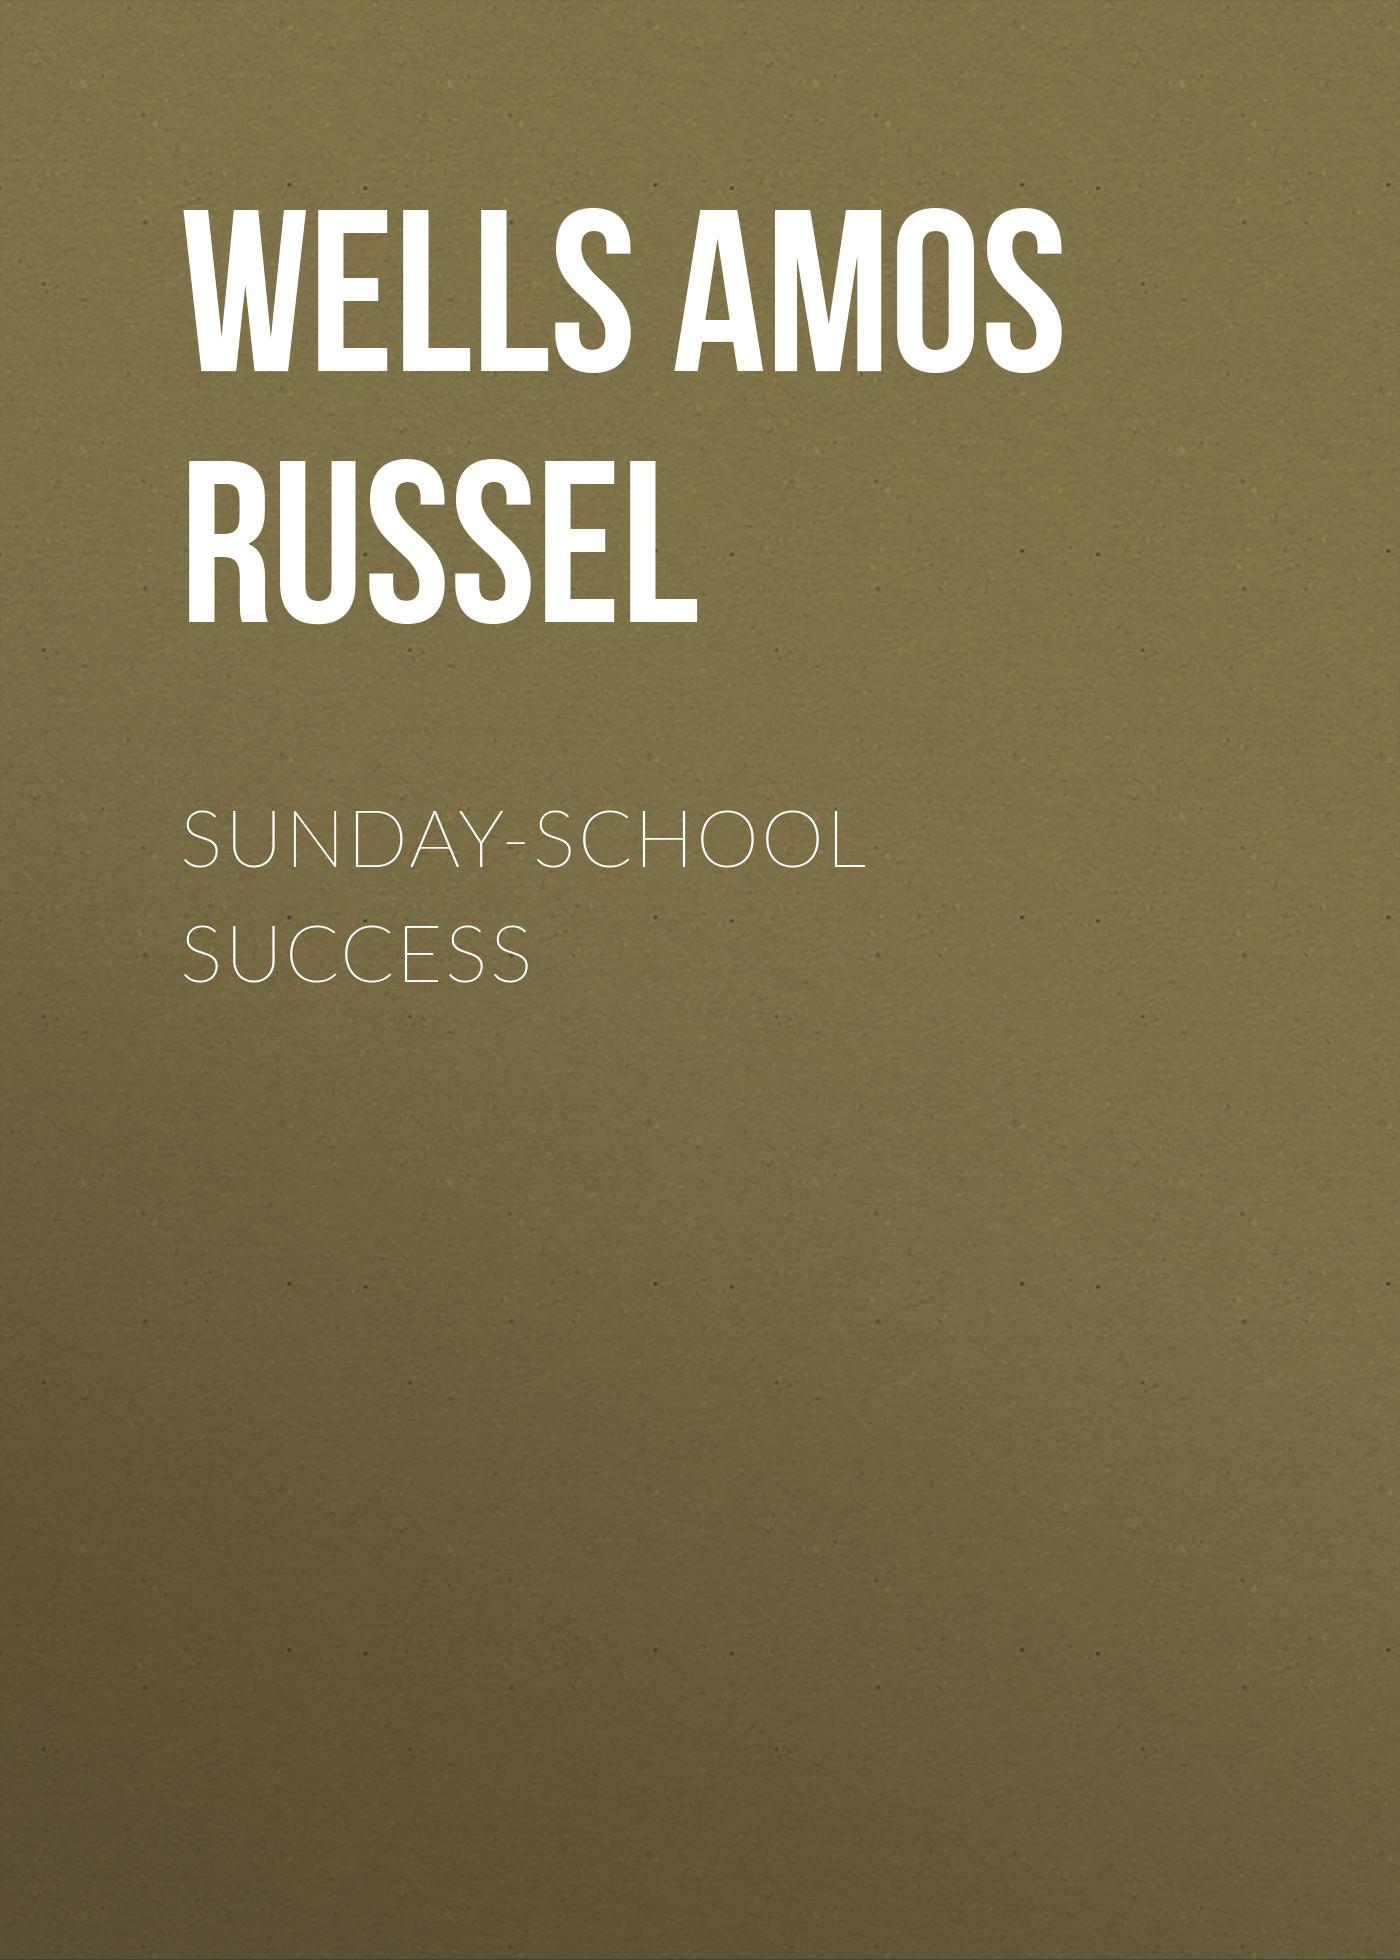 Wells Amos Russel Sunday-School Success mysteryland 2018 sunday